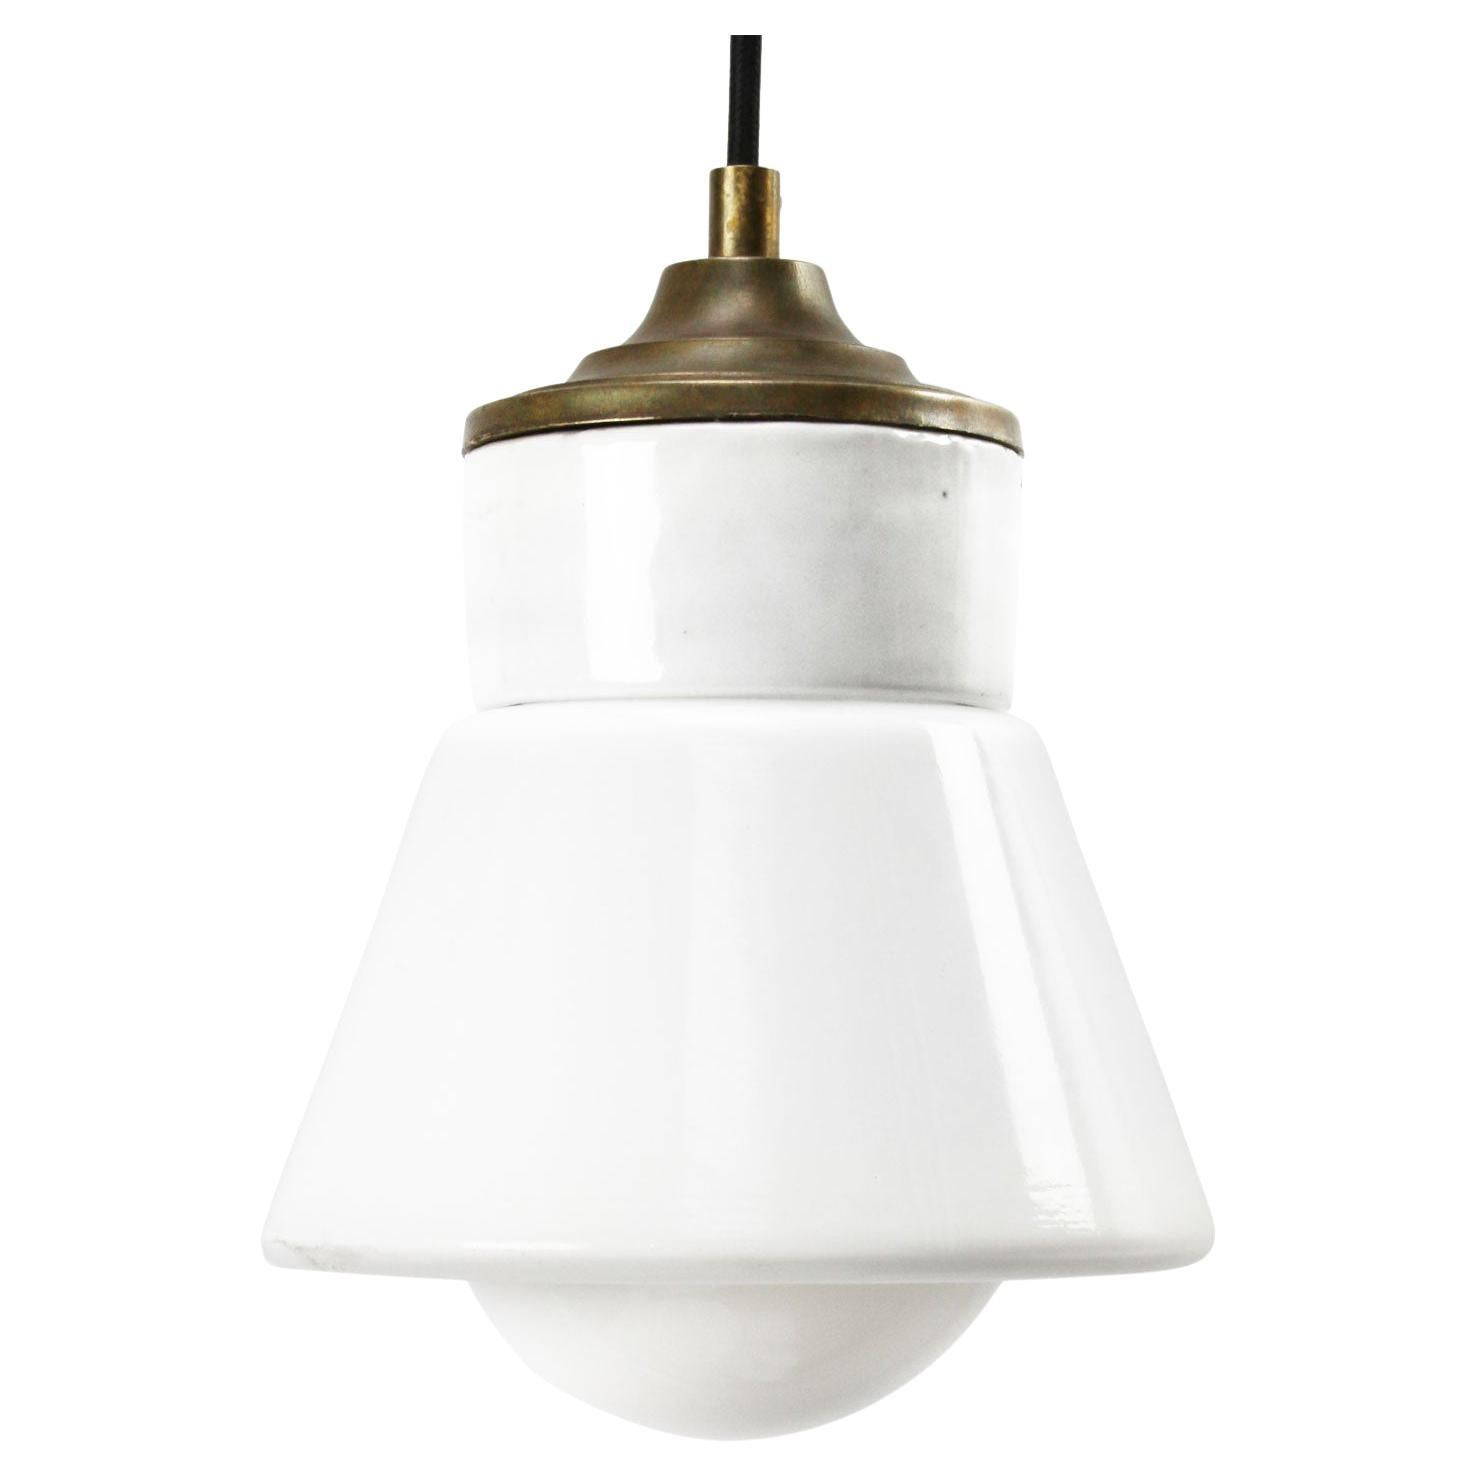 White Porcelain Opaline Glass Vintage Industrial Brass Pendant Lights